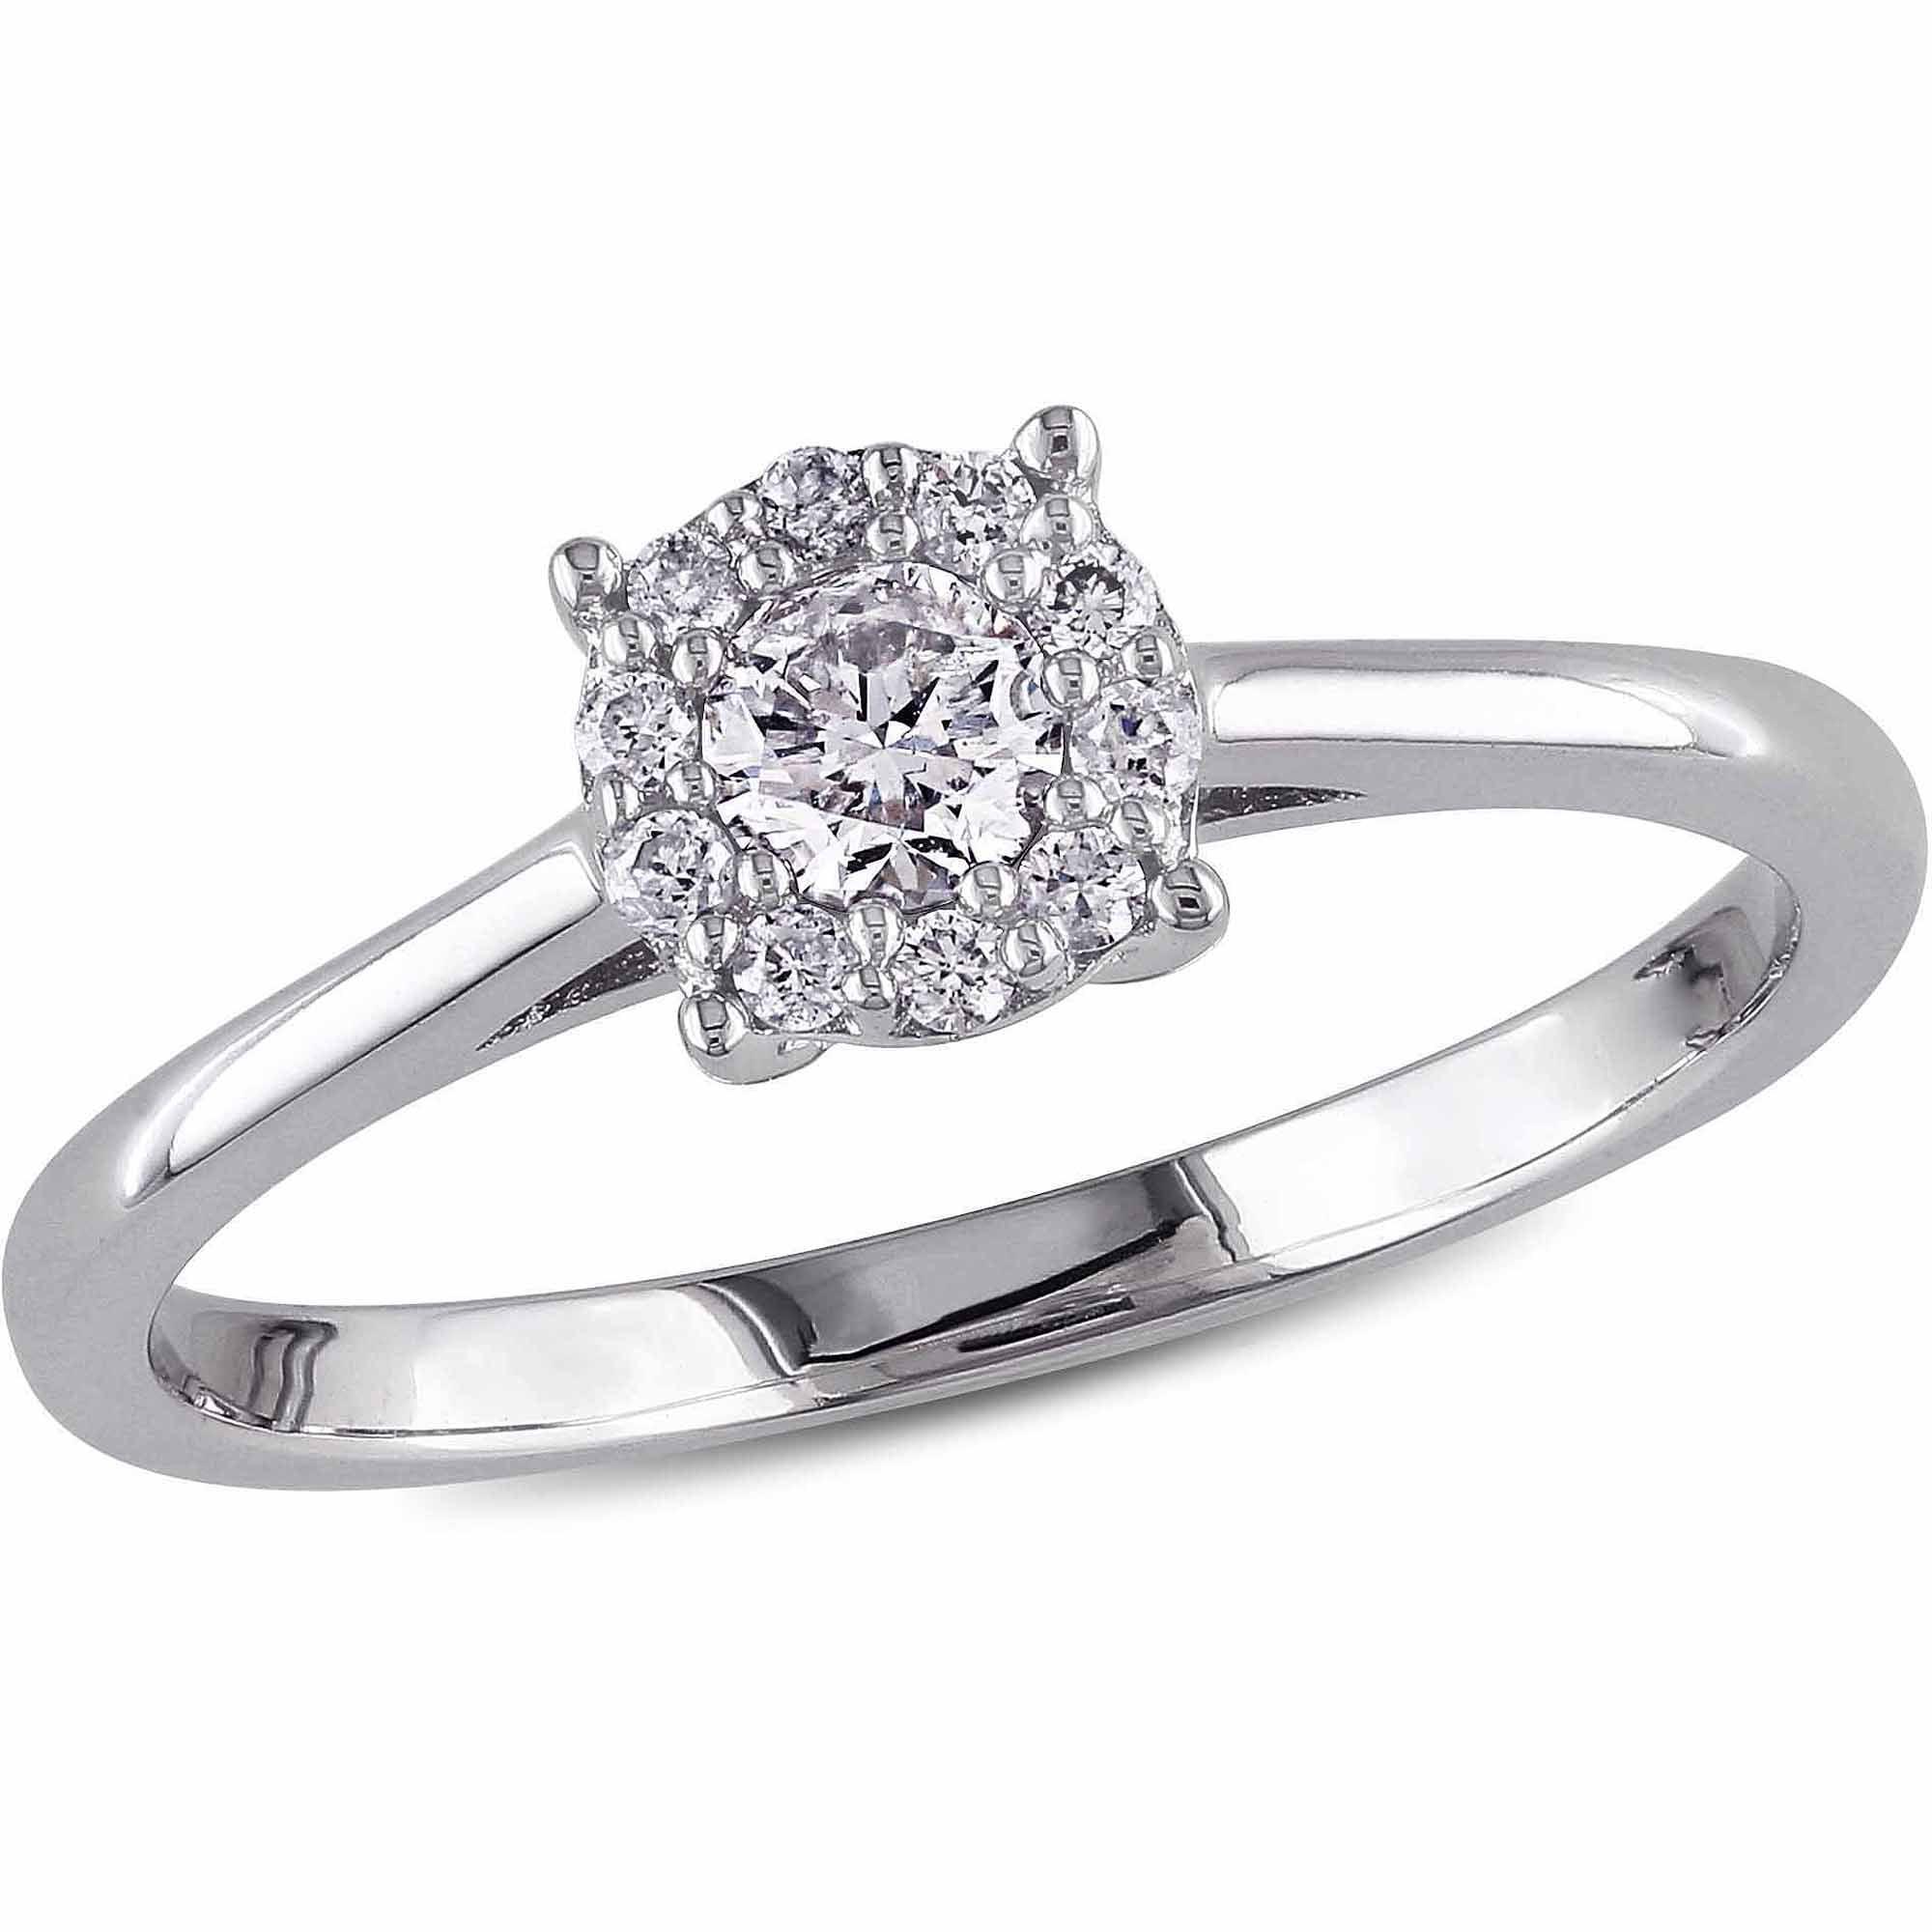 Miabella 1 4 Carat Diamond 10kt White Gold Halo Engagement Ring by Delmar Manufacturing LLC